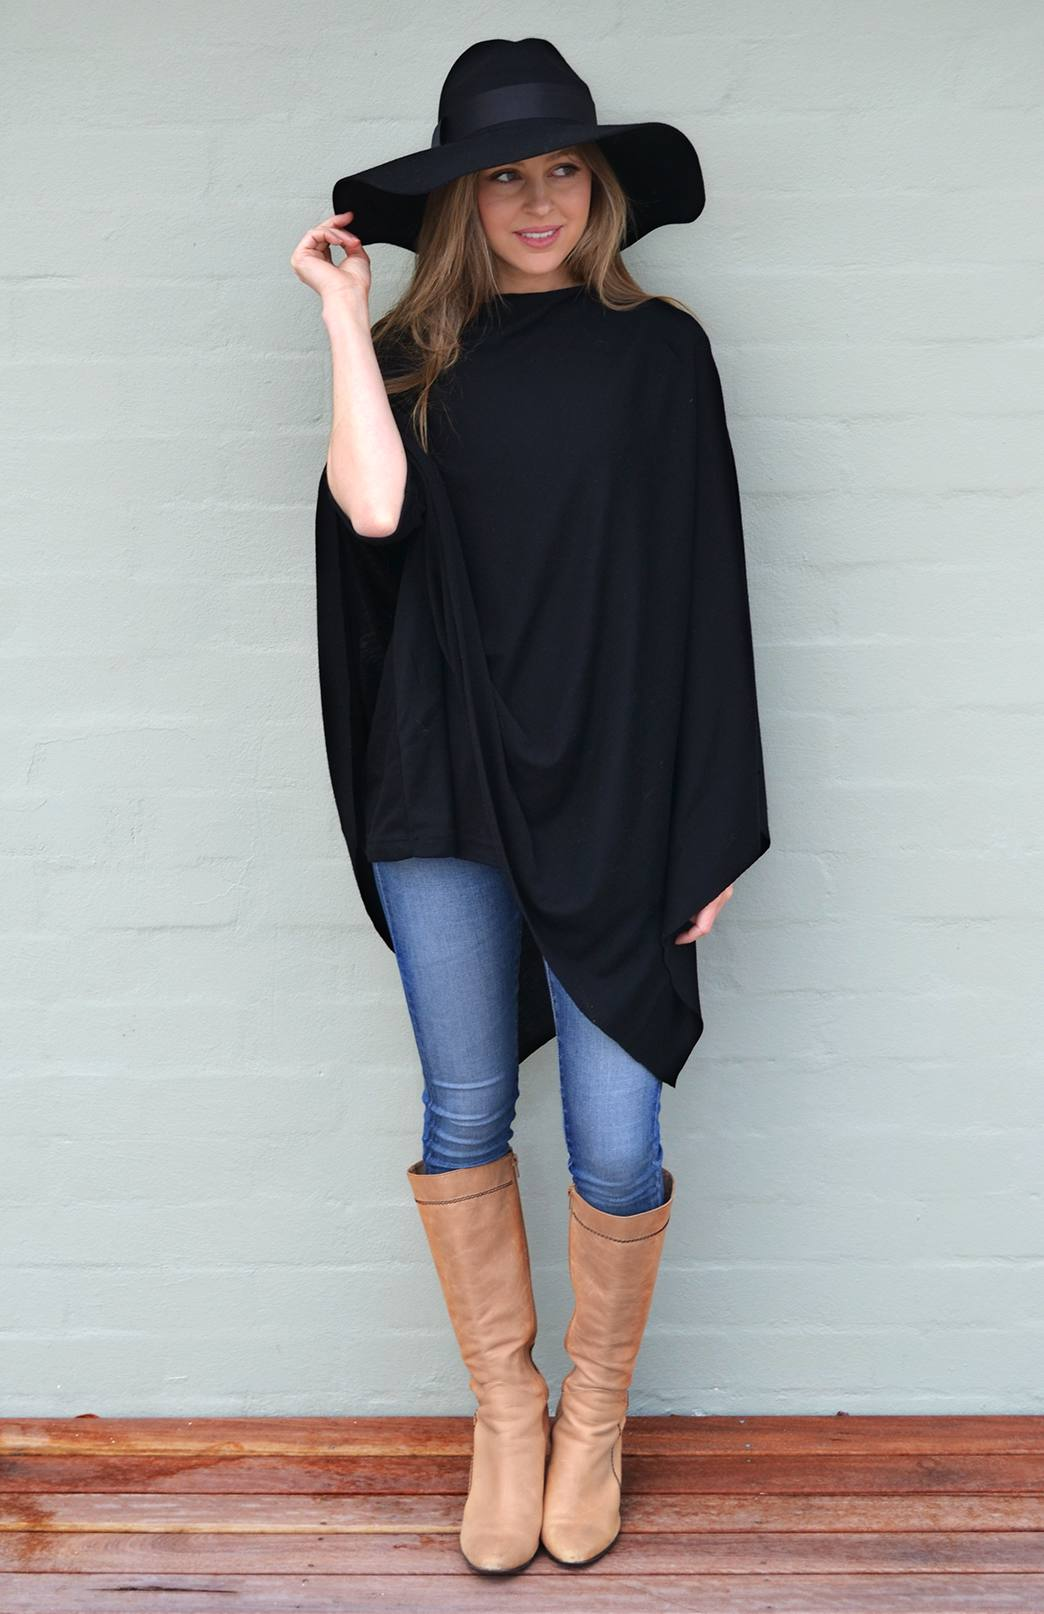 Oversized Poncho - Plain - Women's One Size Fits All Black Wool Poncho - Smitten Merino Tasmania Australia